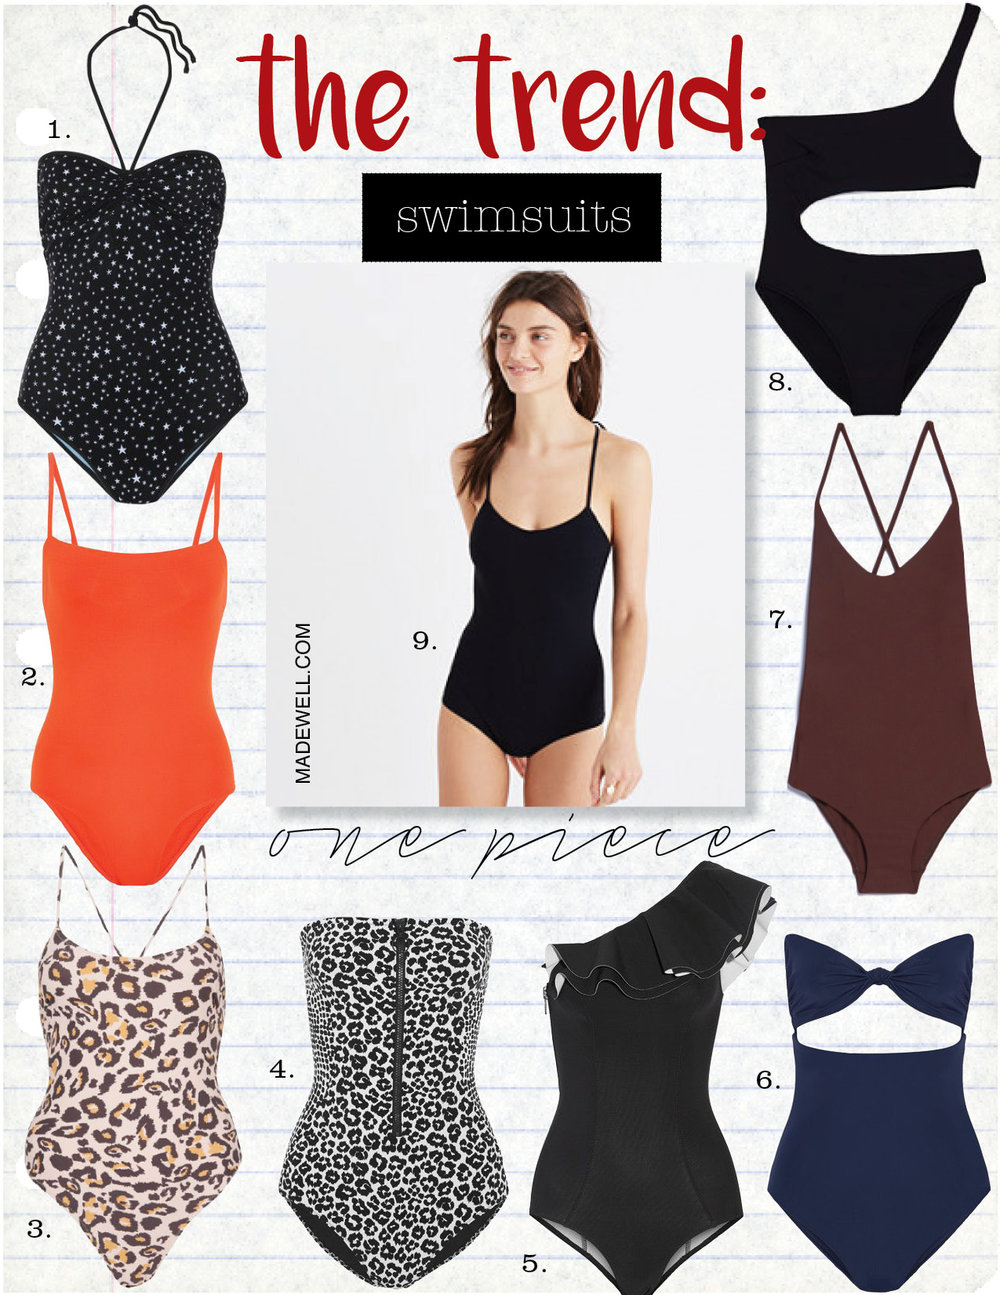 1, diane von furstenberg printed halterneck swimsuit, $250,  net-a-porter.com  2. eres les essentiels aquarelle swimsuit, $280,  net-a-porter.com  3. topshop swimsuit by somedays lovin, $120,  topshop.com  4. stella mccartney printed bandeau swimsuit, $245,  net-a-porter.com  5. lisa marie fernandez arden ruffle swimsuit, $465,  net-a-porter.com  6. mara hoffman knotted cutout swimsuit, $230,  net-a-porter.com  7. matteau swim cross back maillot, $280,  needsupply.com  8. zara asymmetric swimwear , $35,  zara.com  9. madewell pale nero tie-strap one-piece swimsuit, $146,  madewell.com